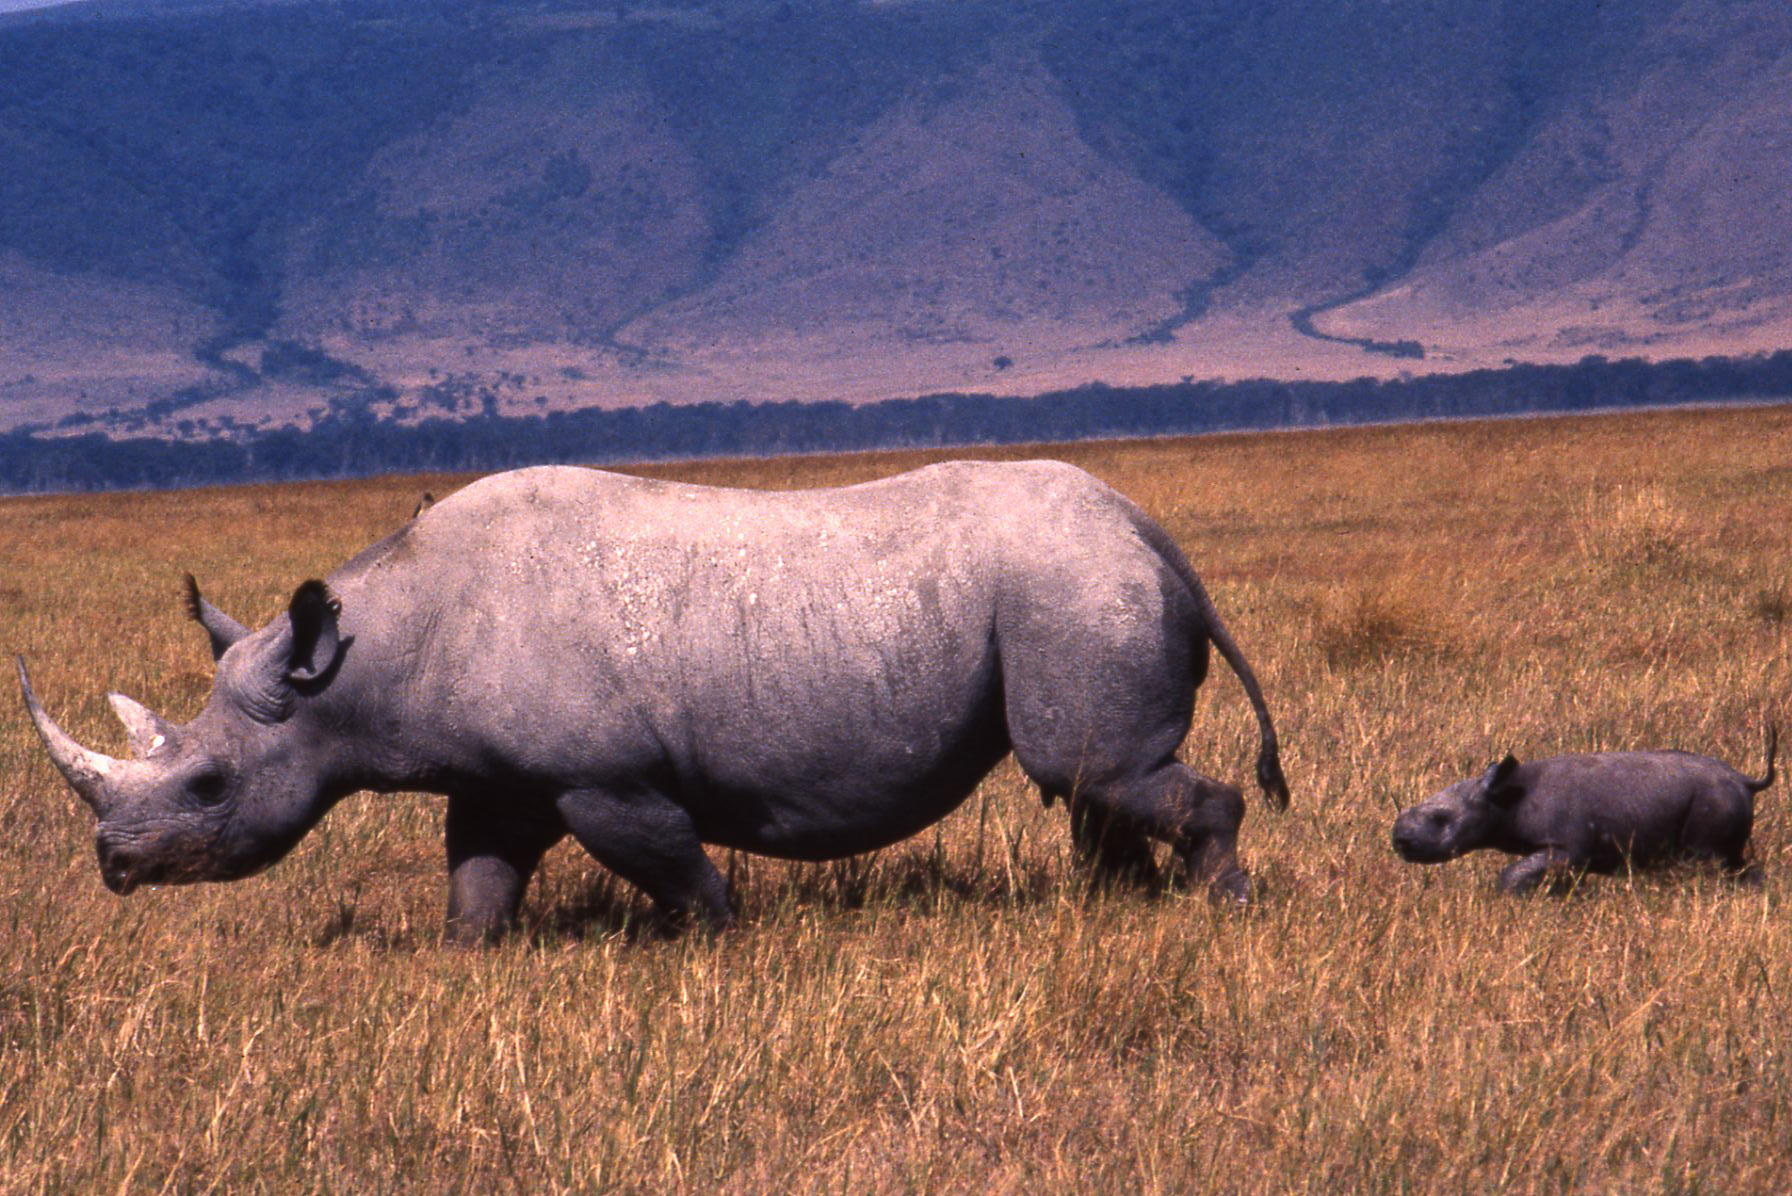 Tanzania, Ngorongoro Crater, Black Rhino & Young Calf